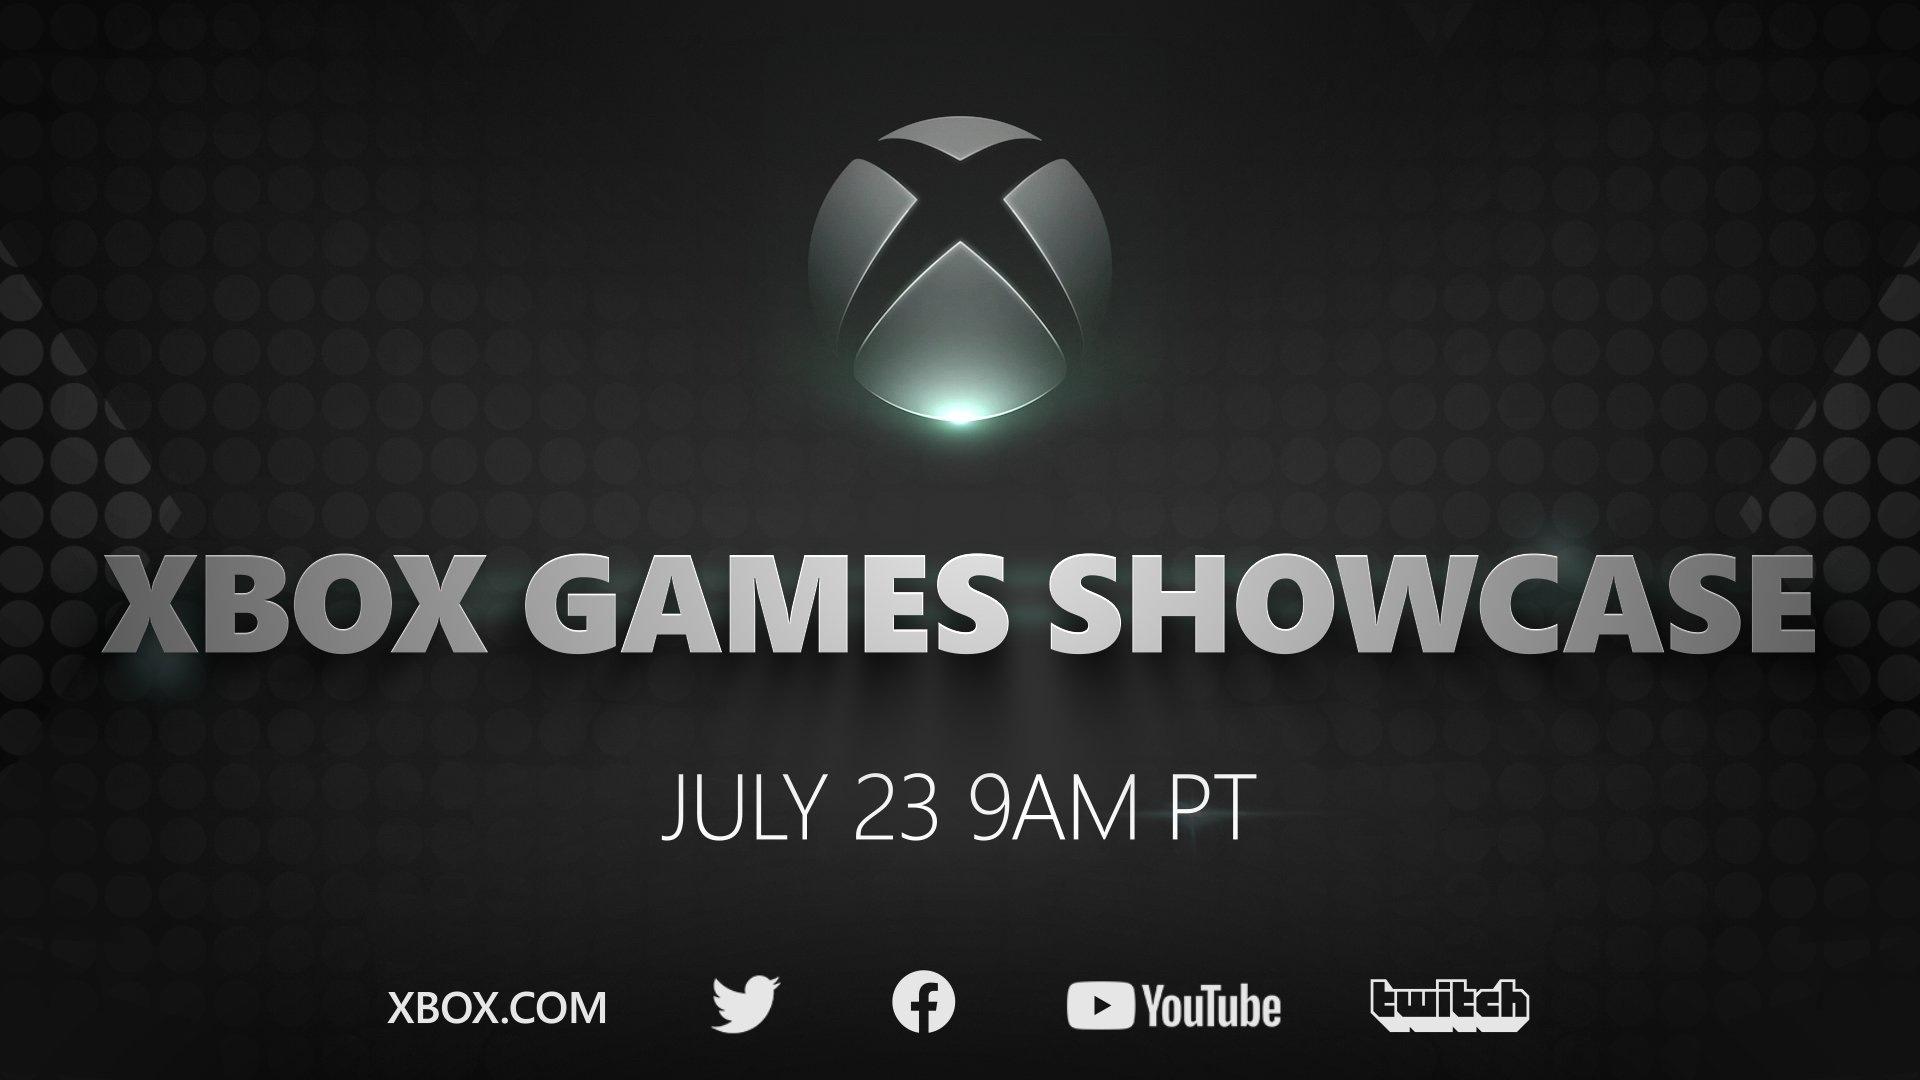 Xbox Games Showcase wallpaper logo